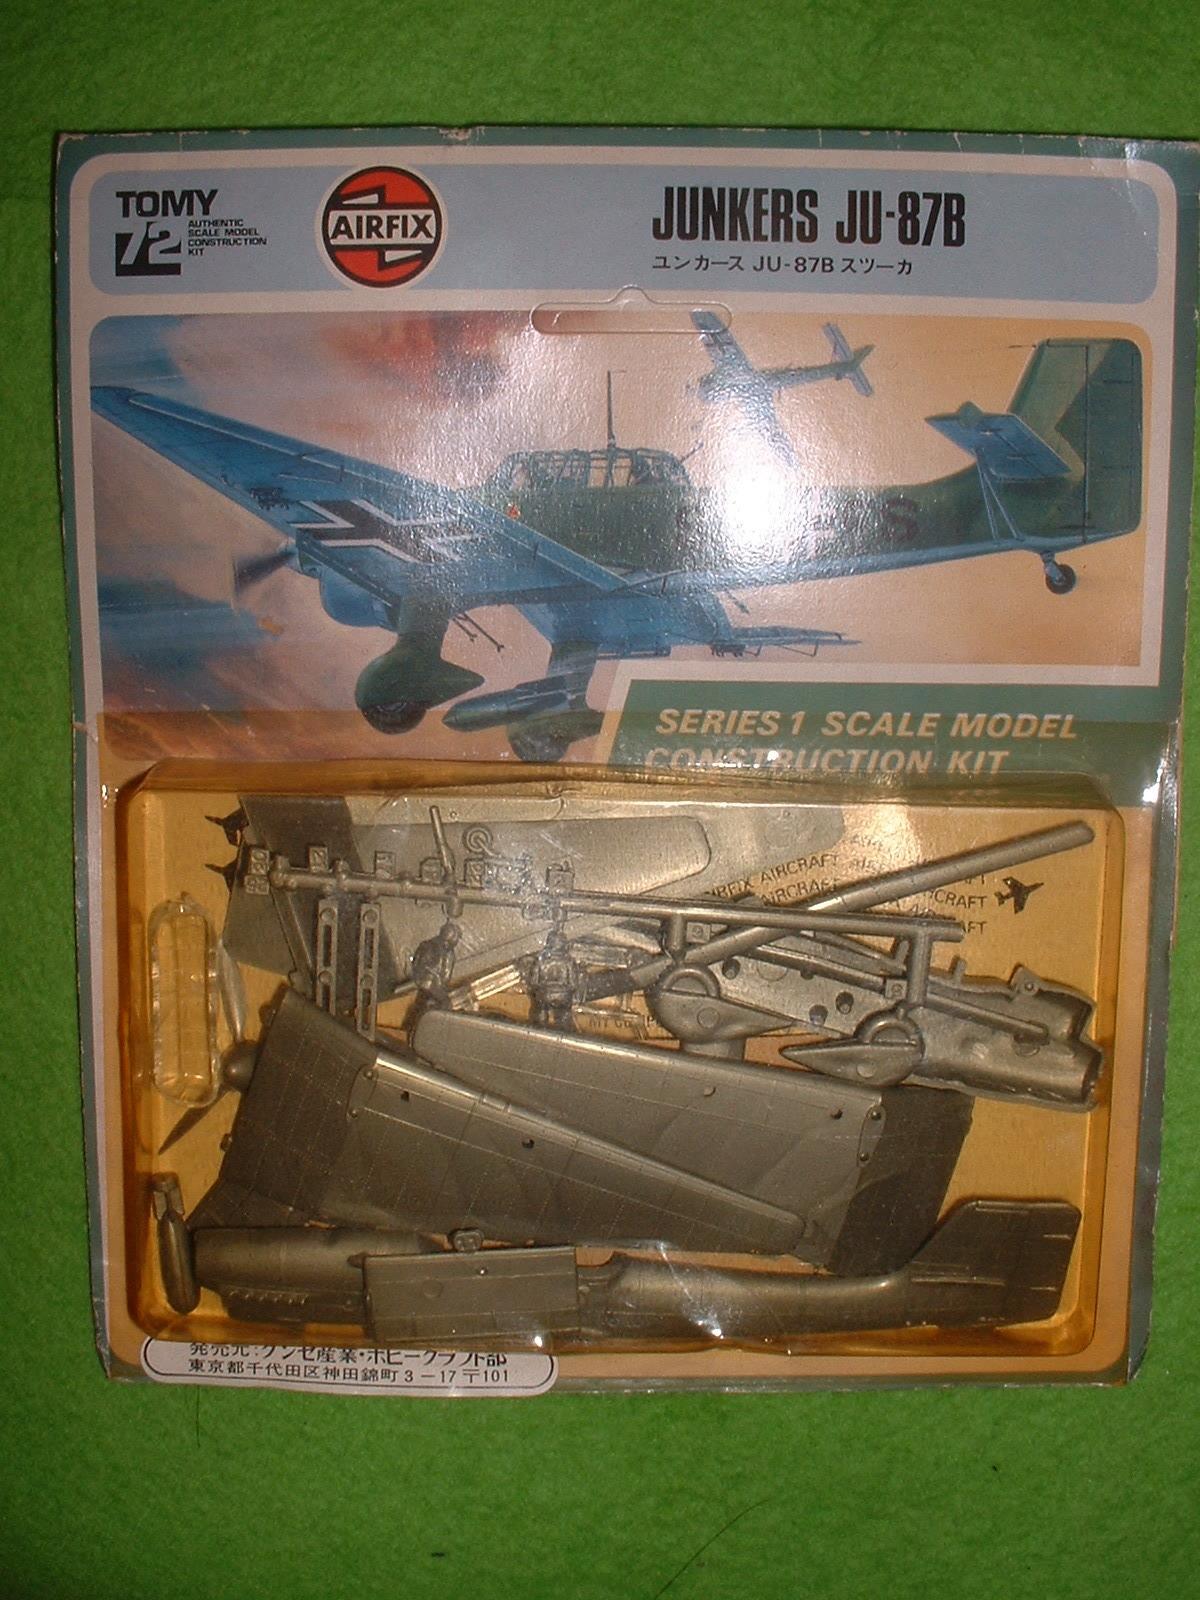 AIRFIX(グンゼ) 72分の1「Ju-87B スーツカ」.JPG